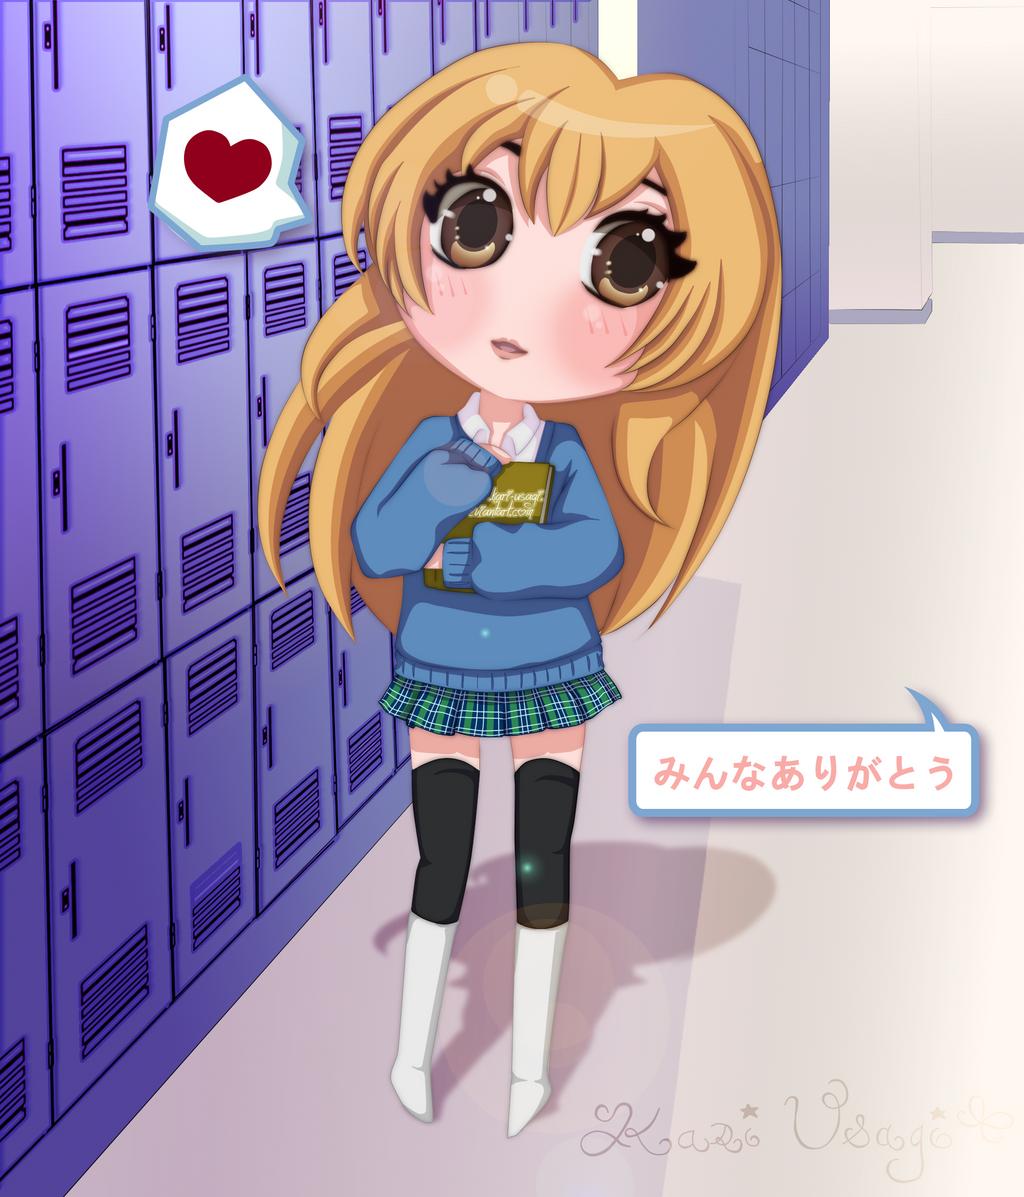 Kari-Usagi's Profile Picture